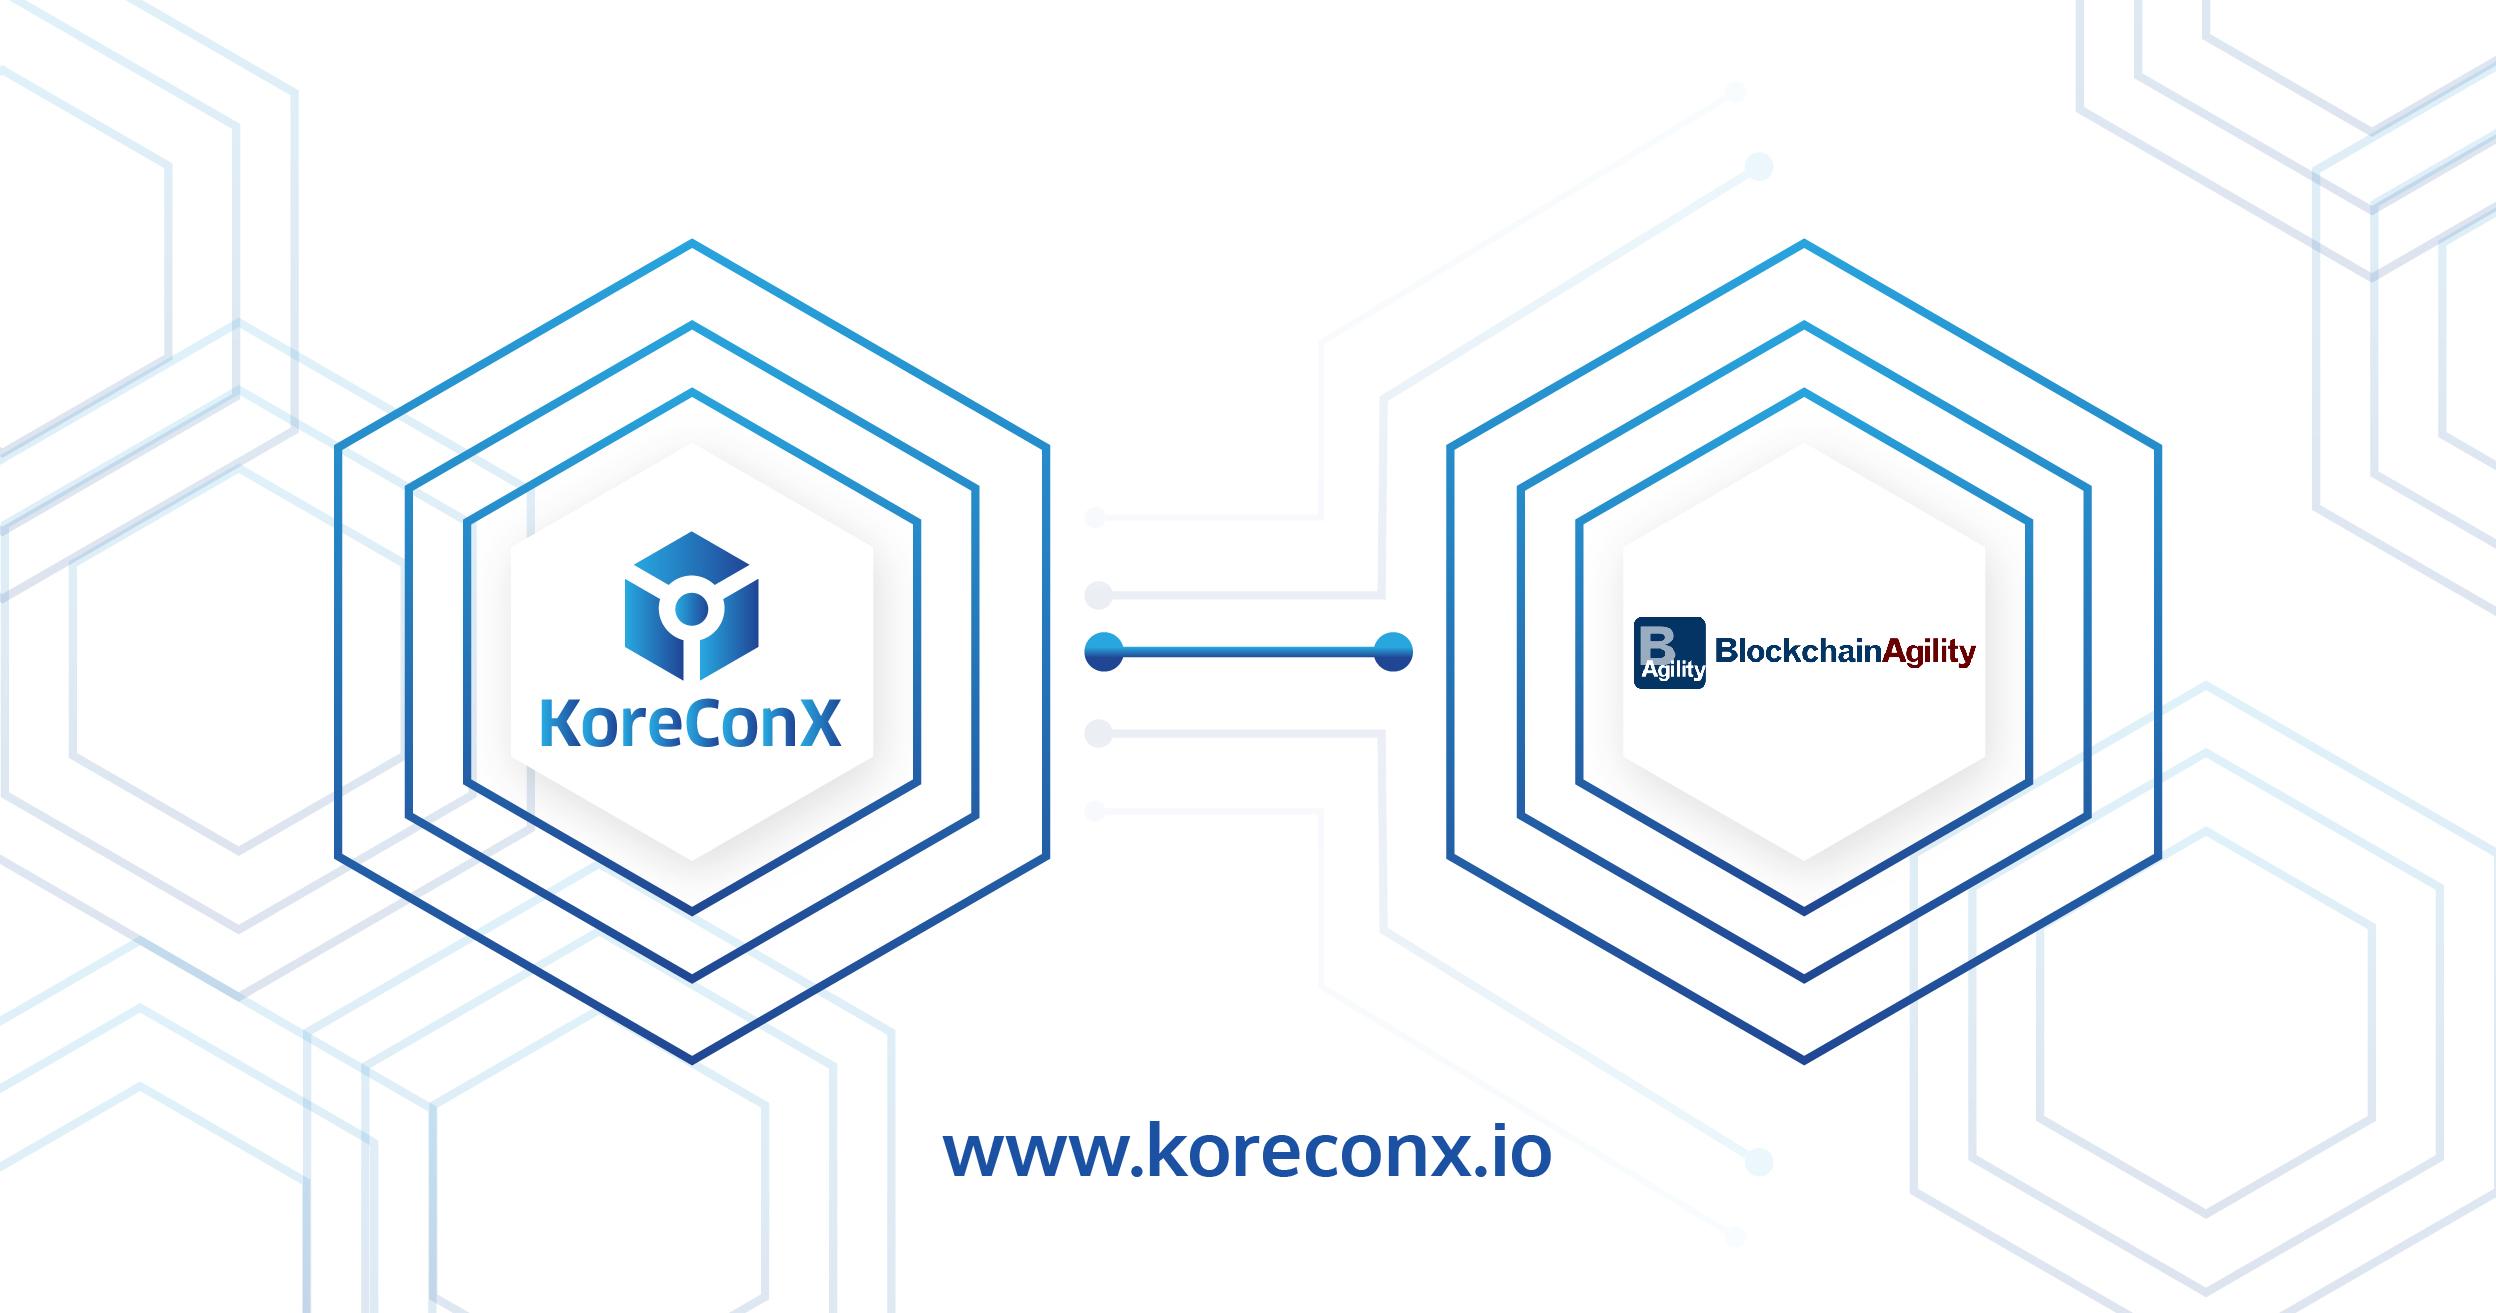 KoreConX BlockchainAgility